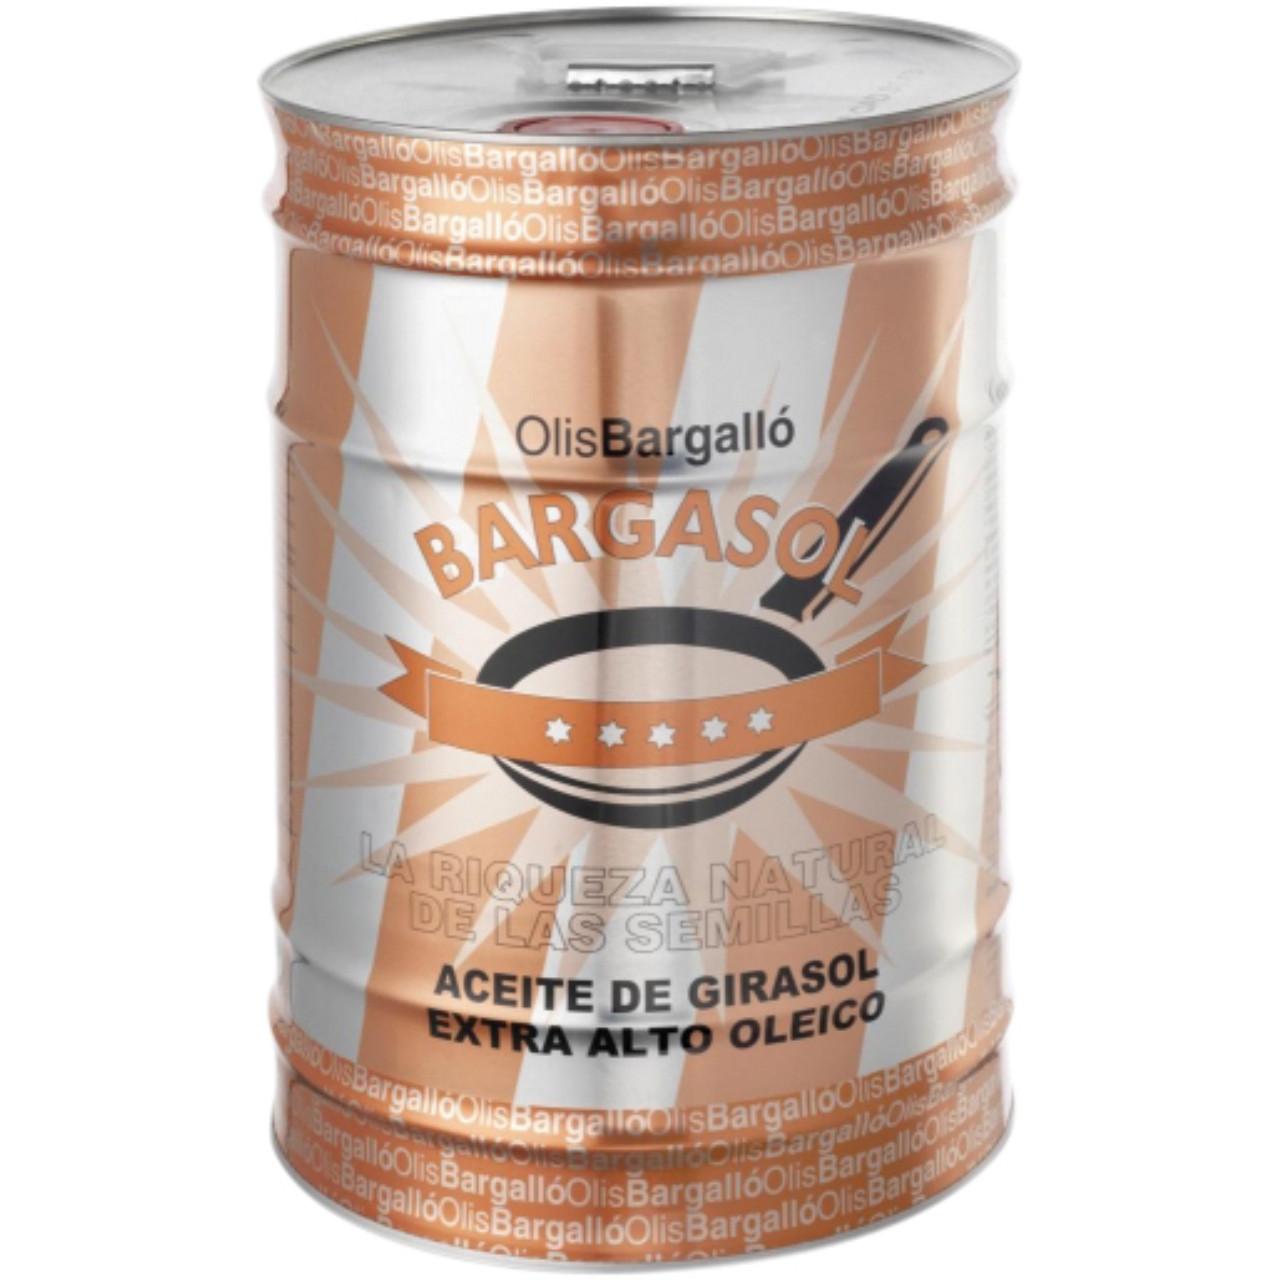 Bargasol oli alt oleic extra llauna Bargalló